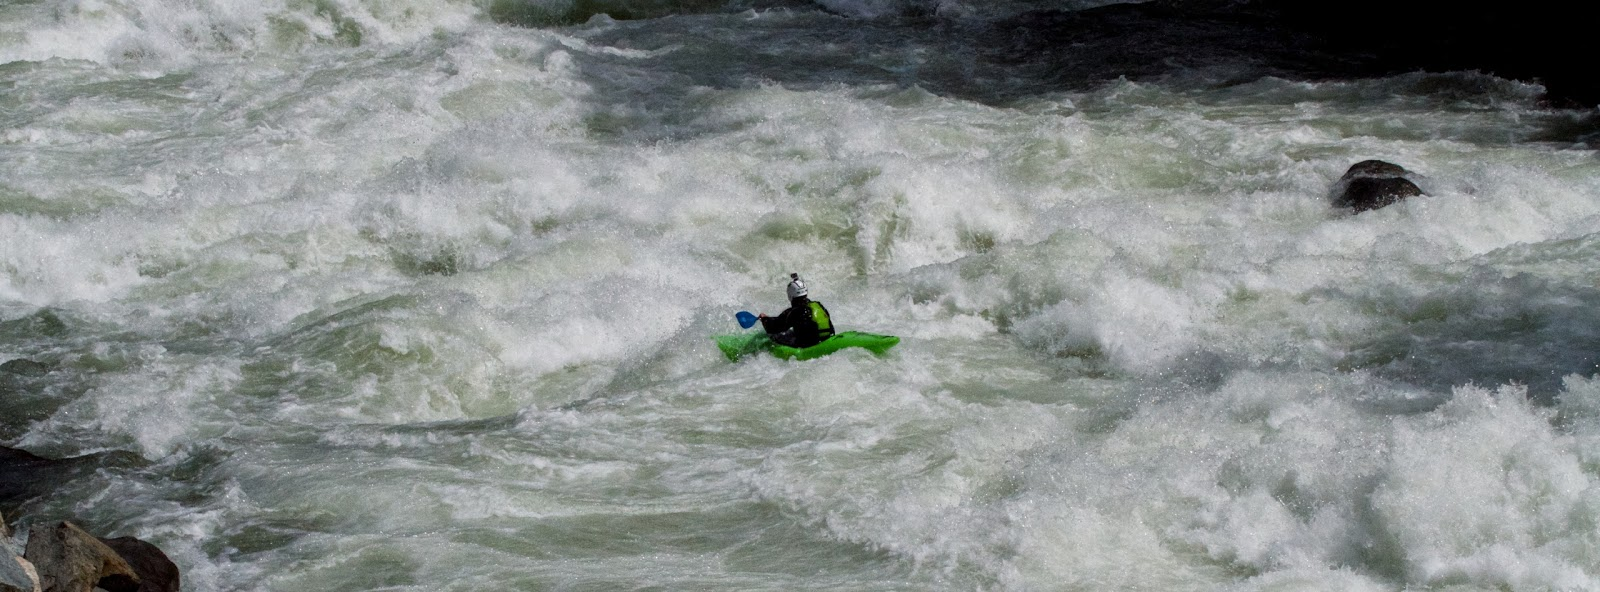 Sam Grafton, Tumwater Canyon Kayaking, Tumwater Canyon, Wenatchee River Kayaking, Kokatat, Sweet Protection, Werner Paddles, Dagger Mamba 8.6, 2014 Dagger Mamba 8.6, New Mamba 8.6, Chaos, POW, Last Exit, The Wall